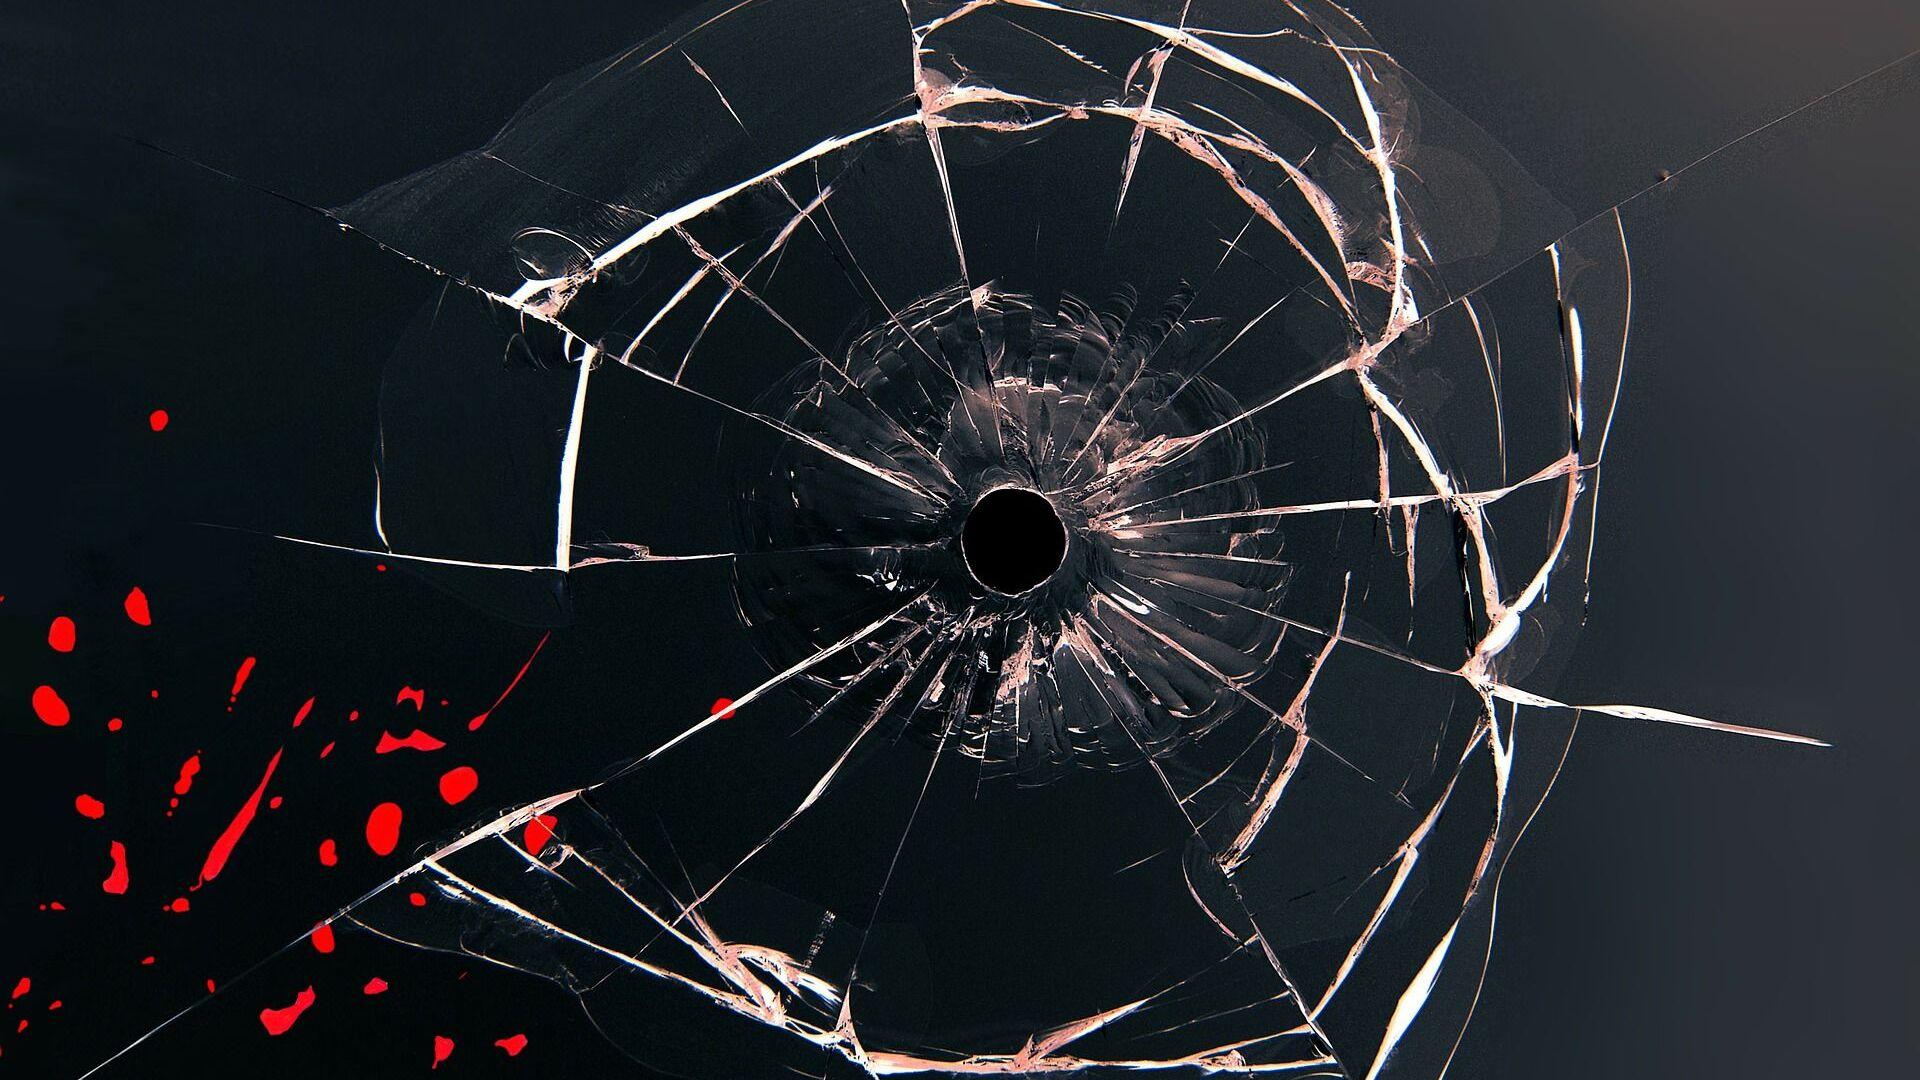 Un cristal roto (imagen referencial) - Sputnik Mundo, 1920, 12.08.2021